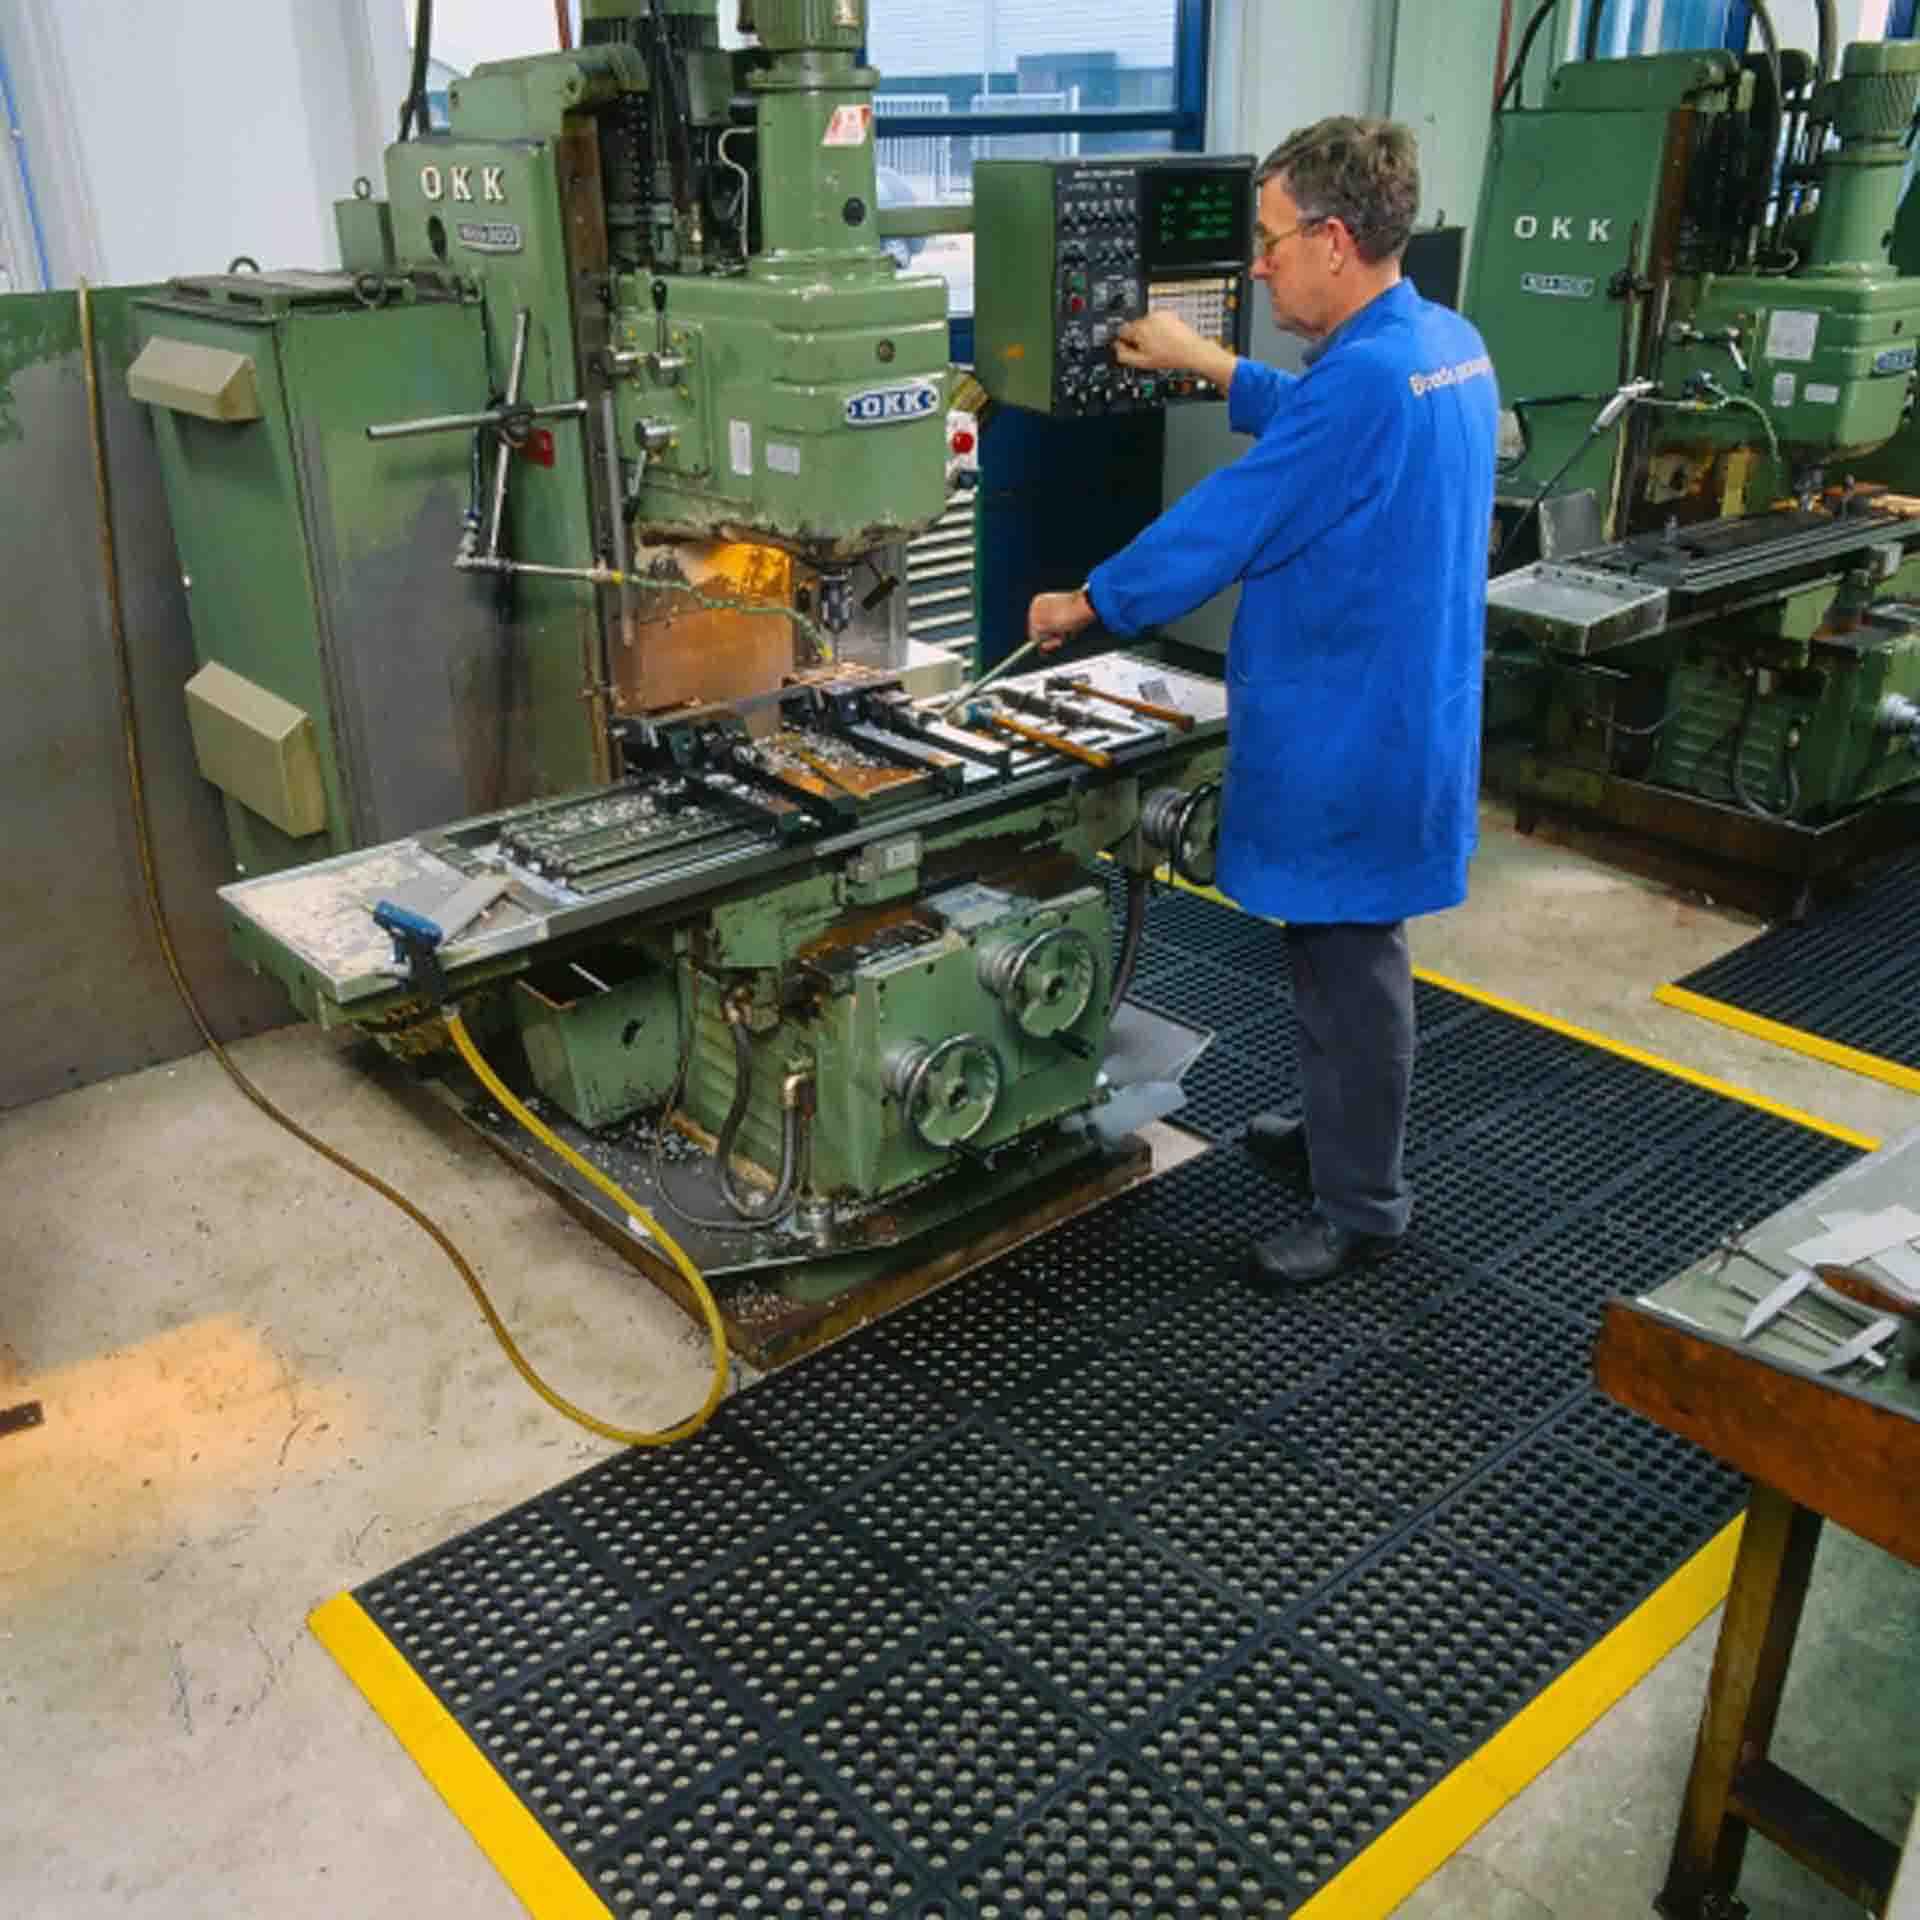 Cushion ease anti vermoeidheidsmatten industriele hulpmiddelen 0006s 0001 Omgeving